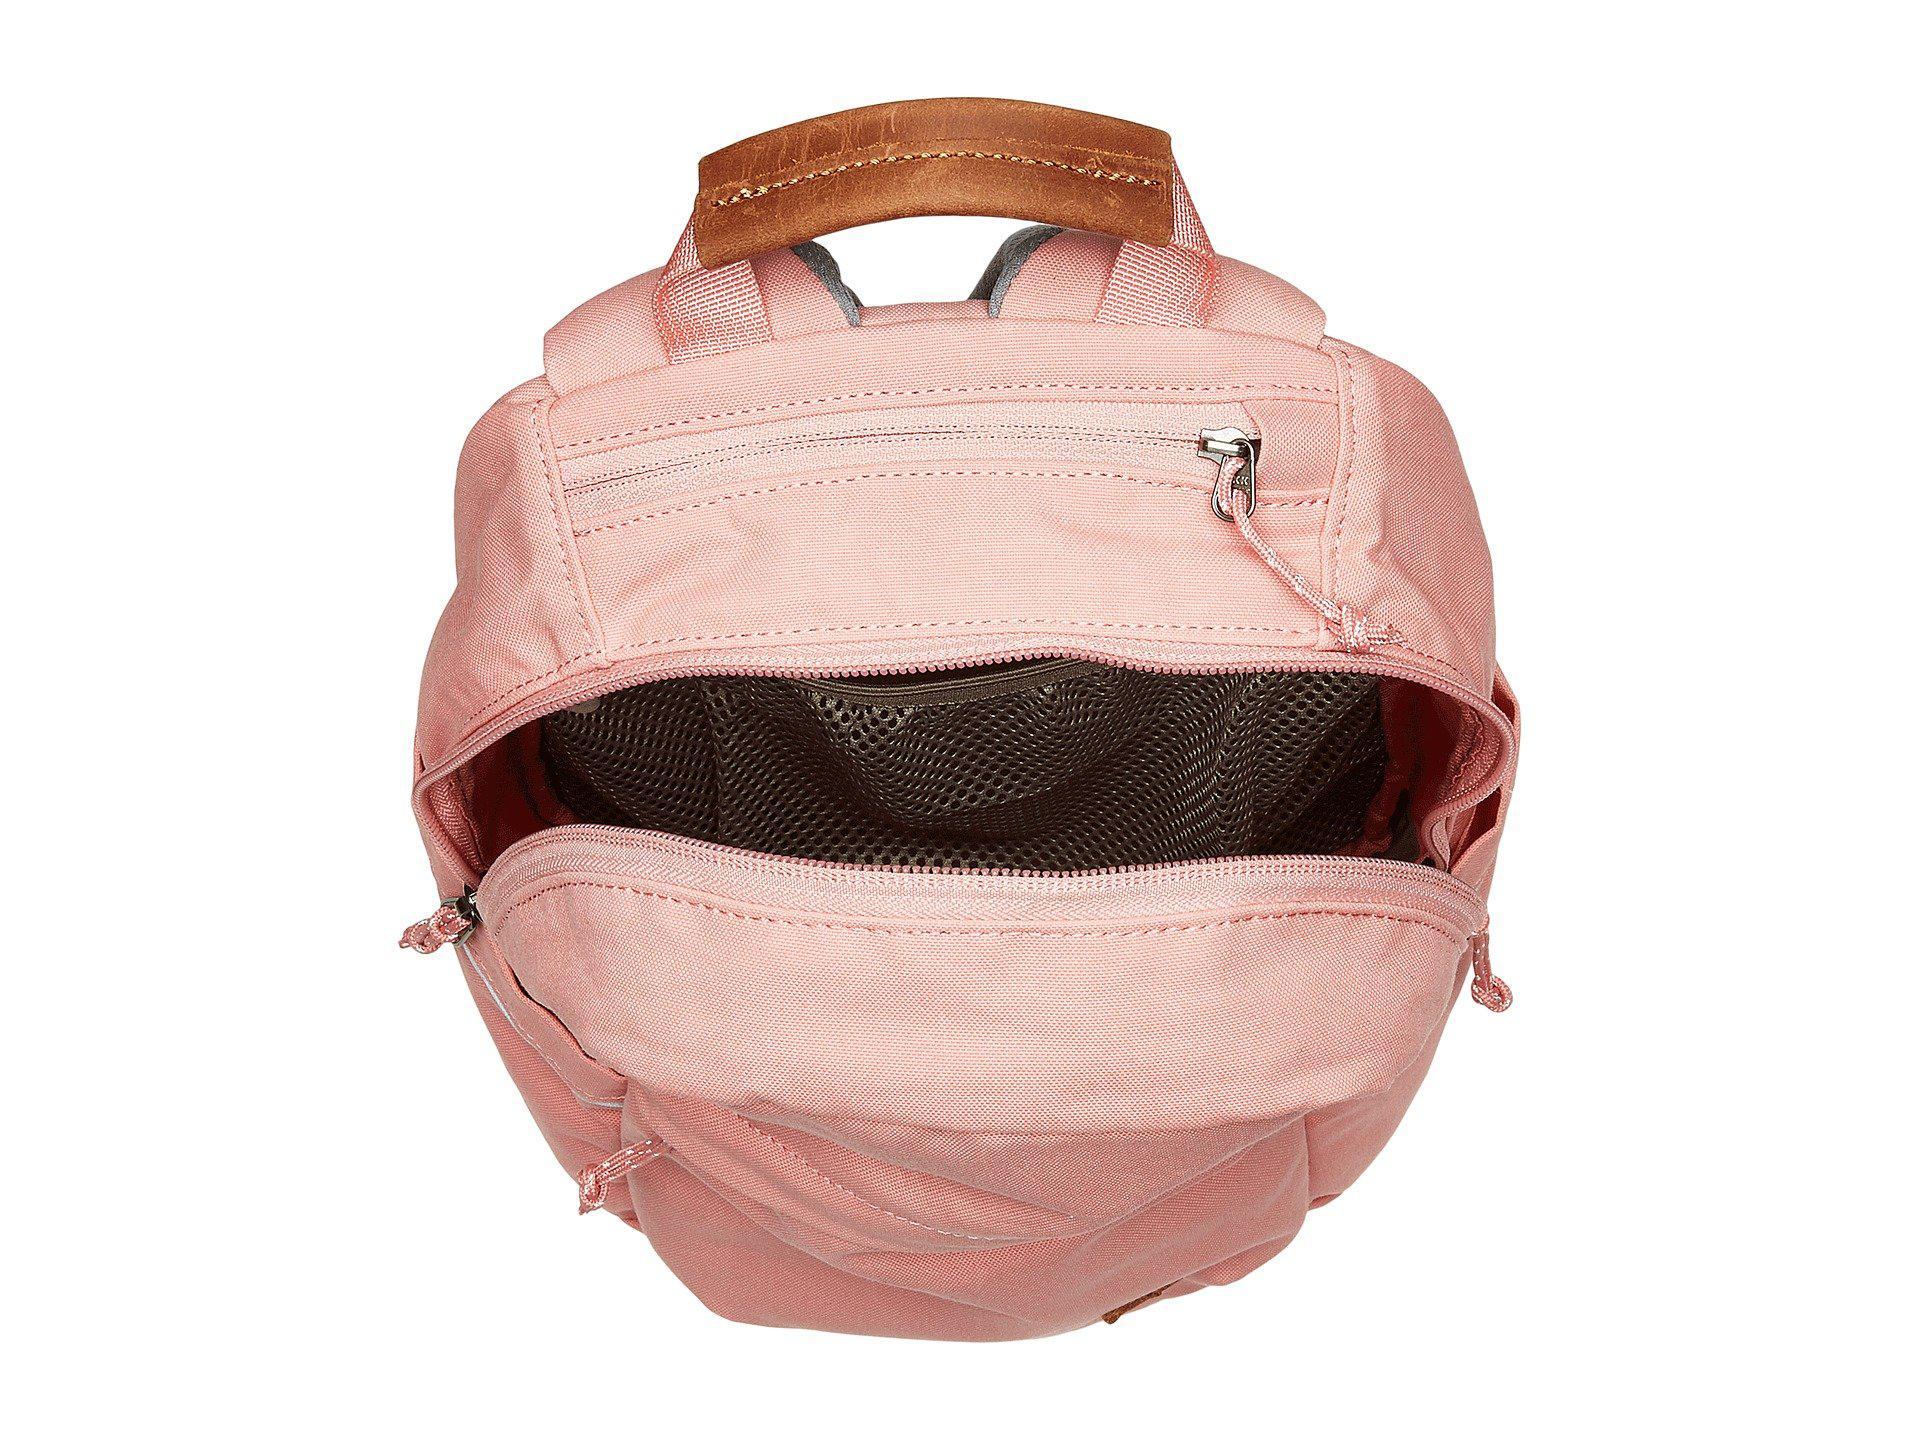 6d7d1f96f719 Lyst - Fjallraven Raven Mini Backpack in Pink for Men